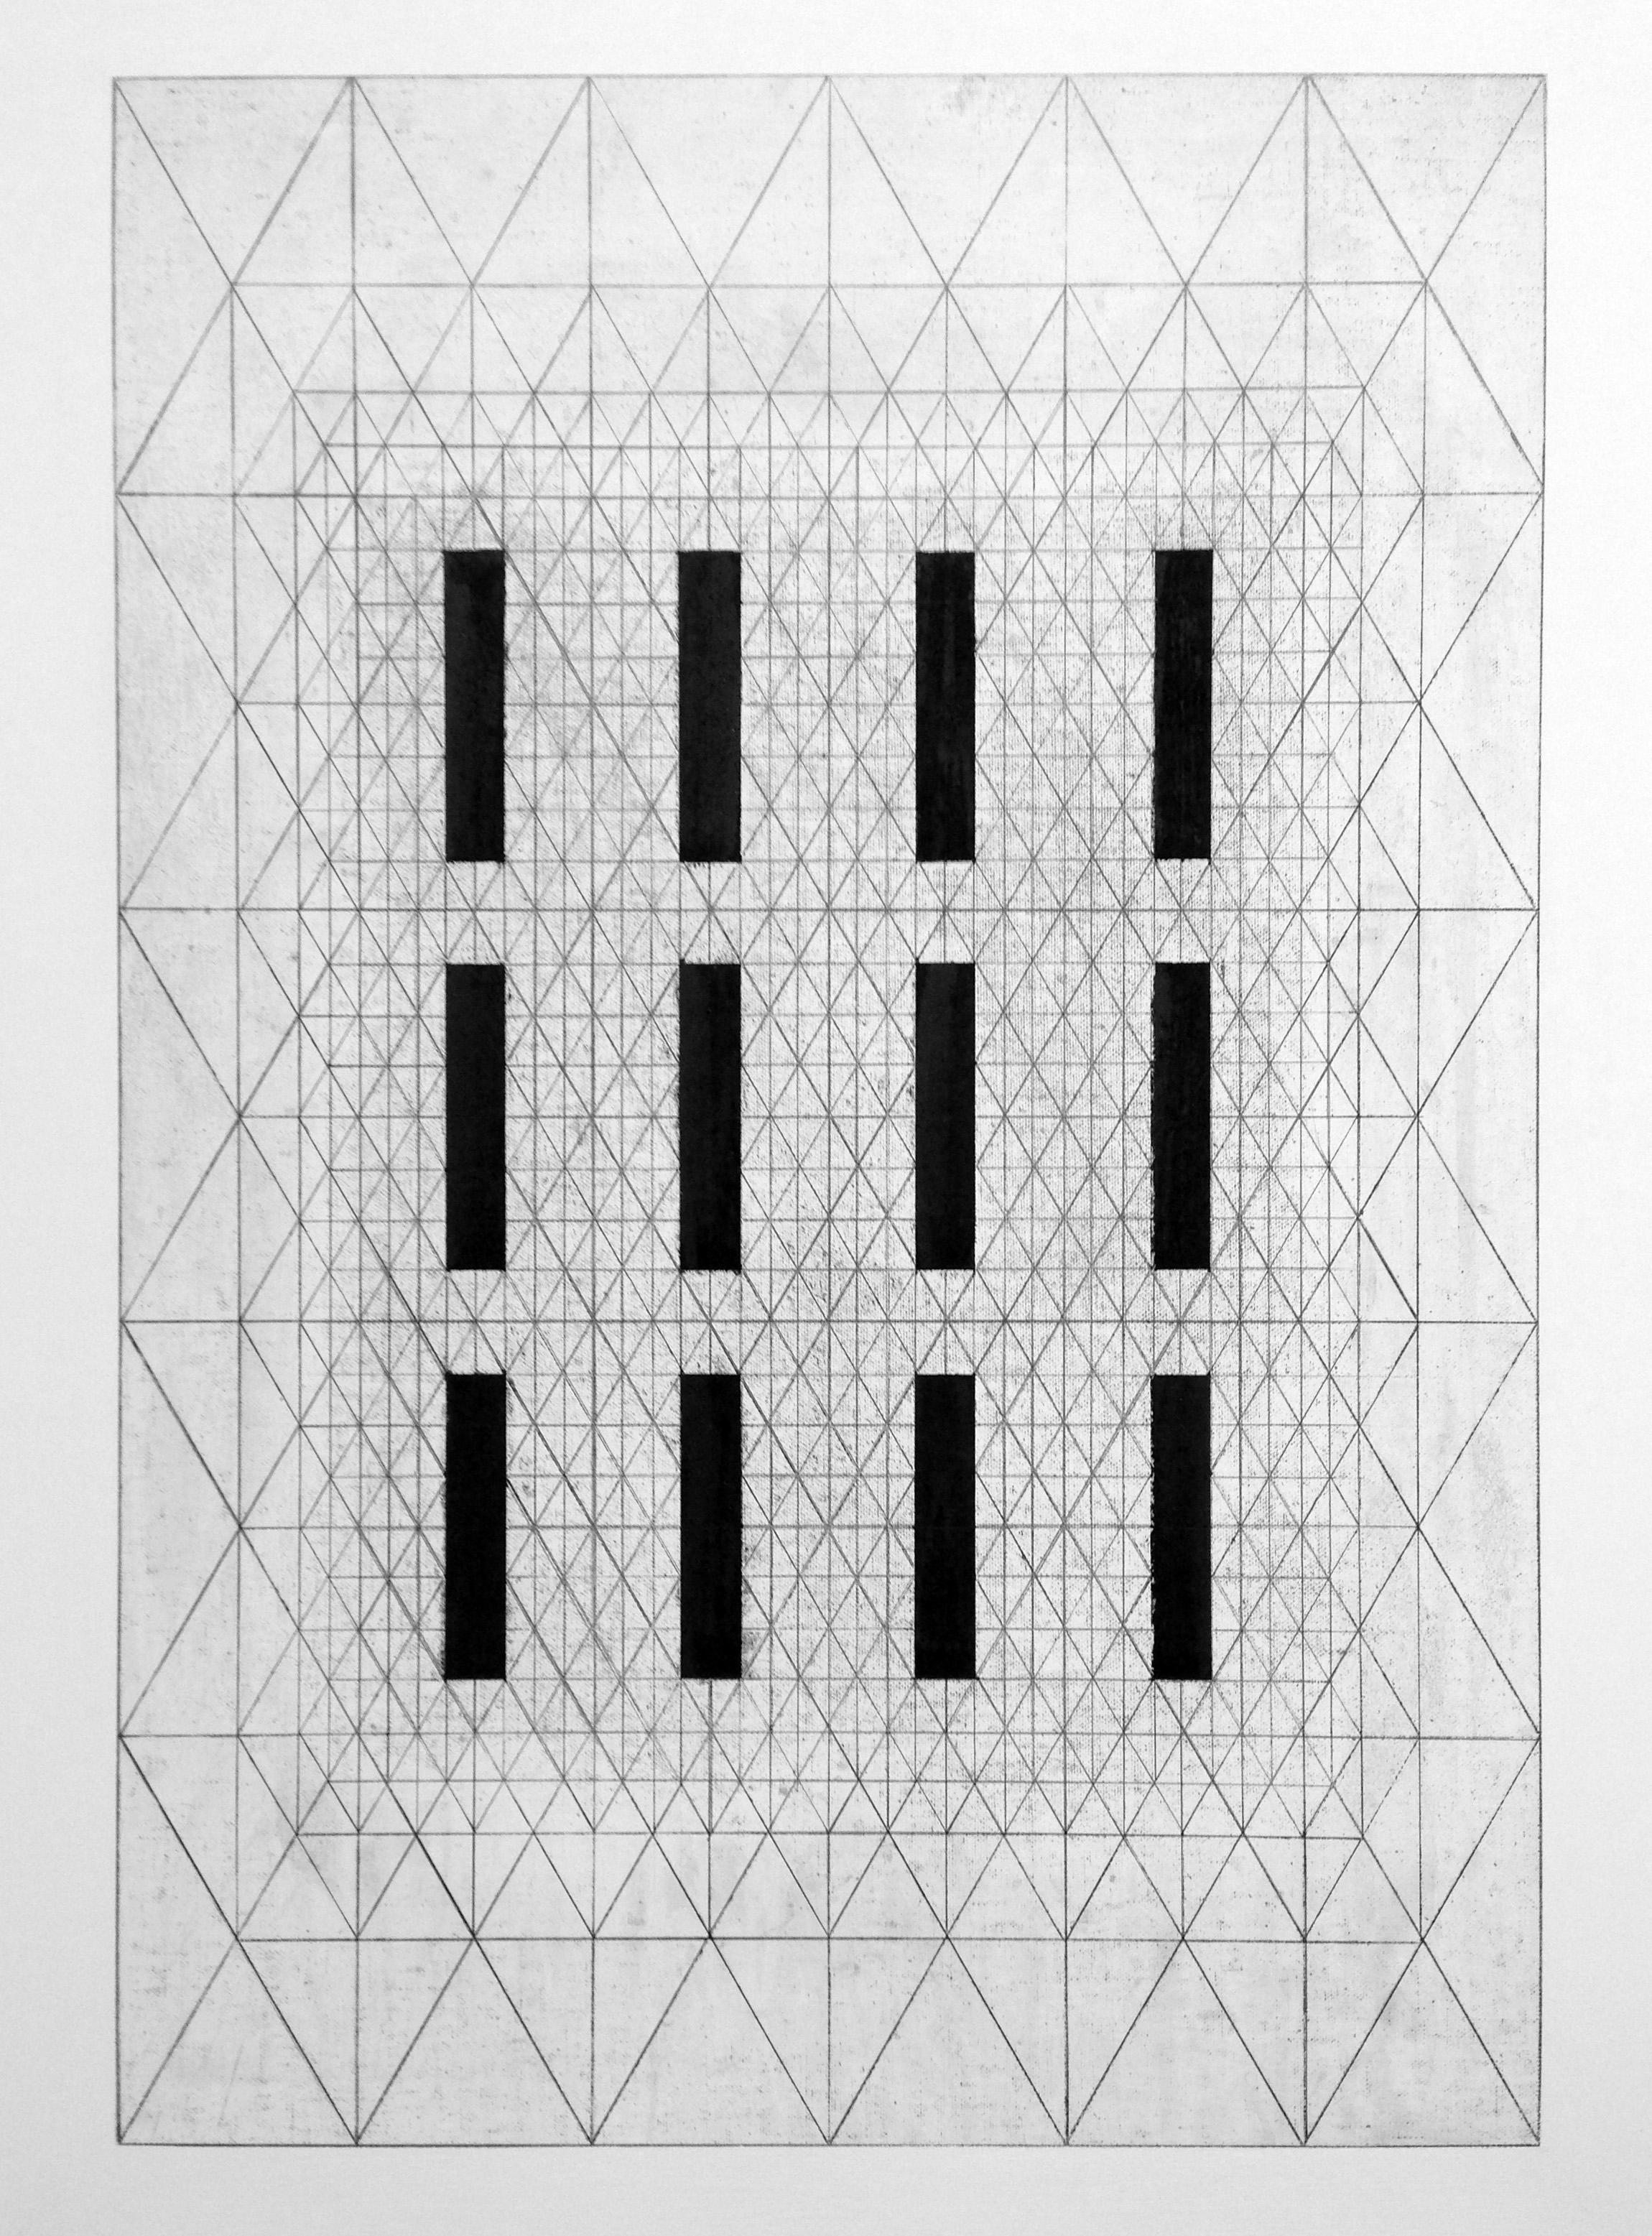 12 lines - graphite drawing graphite & graphite dust